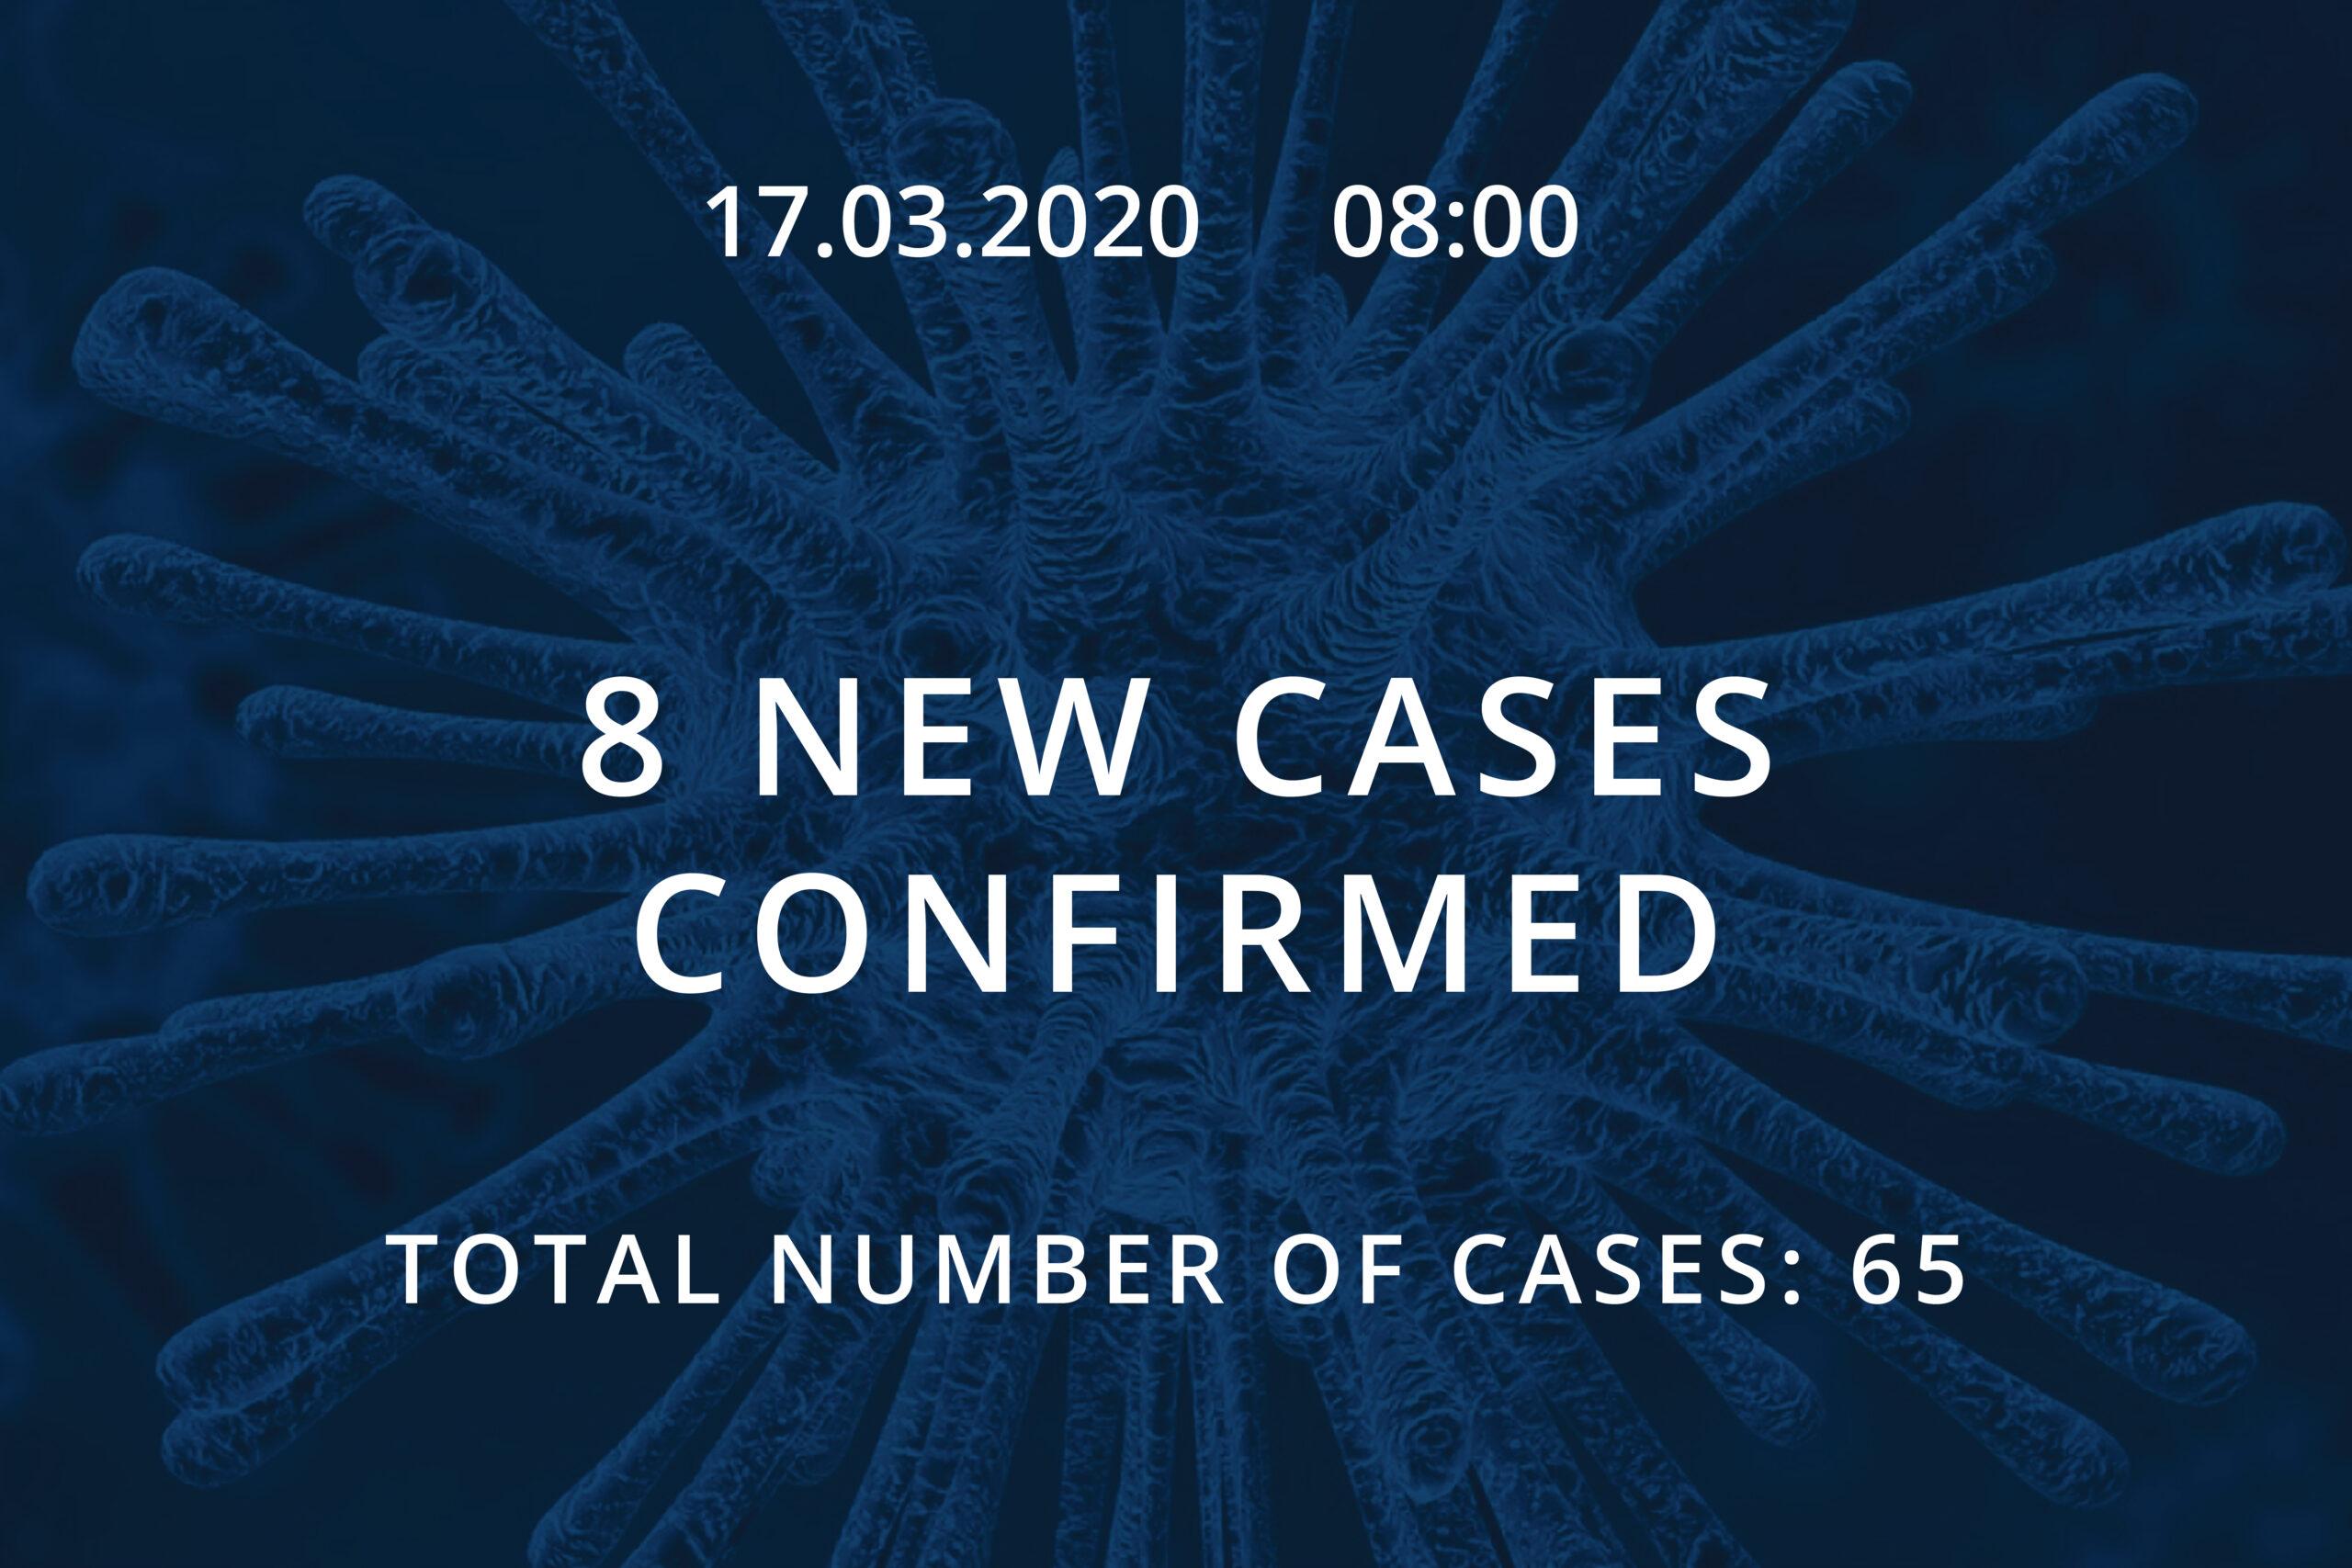 Information about coronavirus COVID-19, 17.03.2020 at 08:00